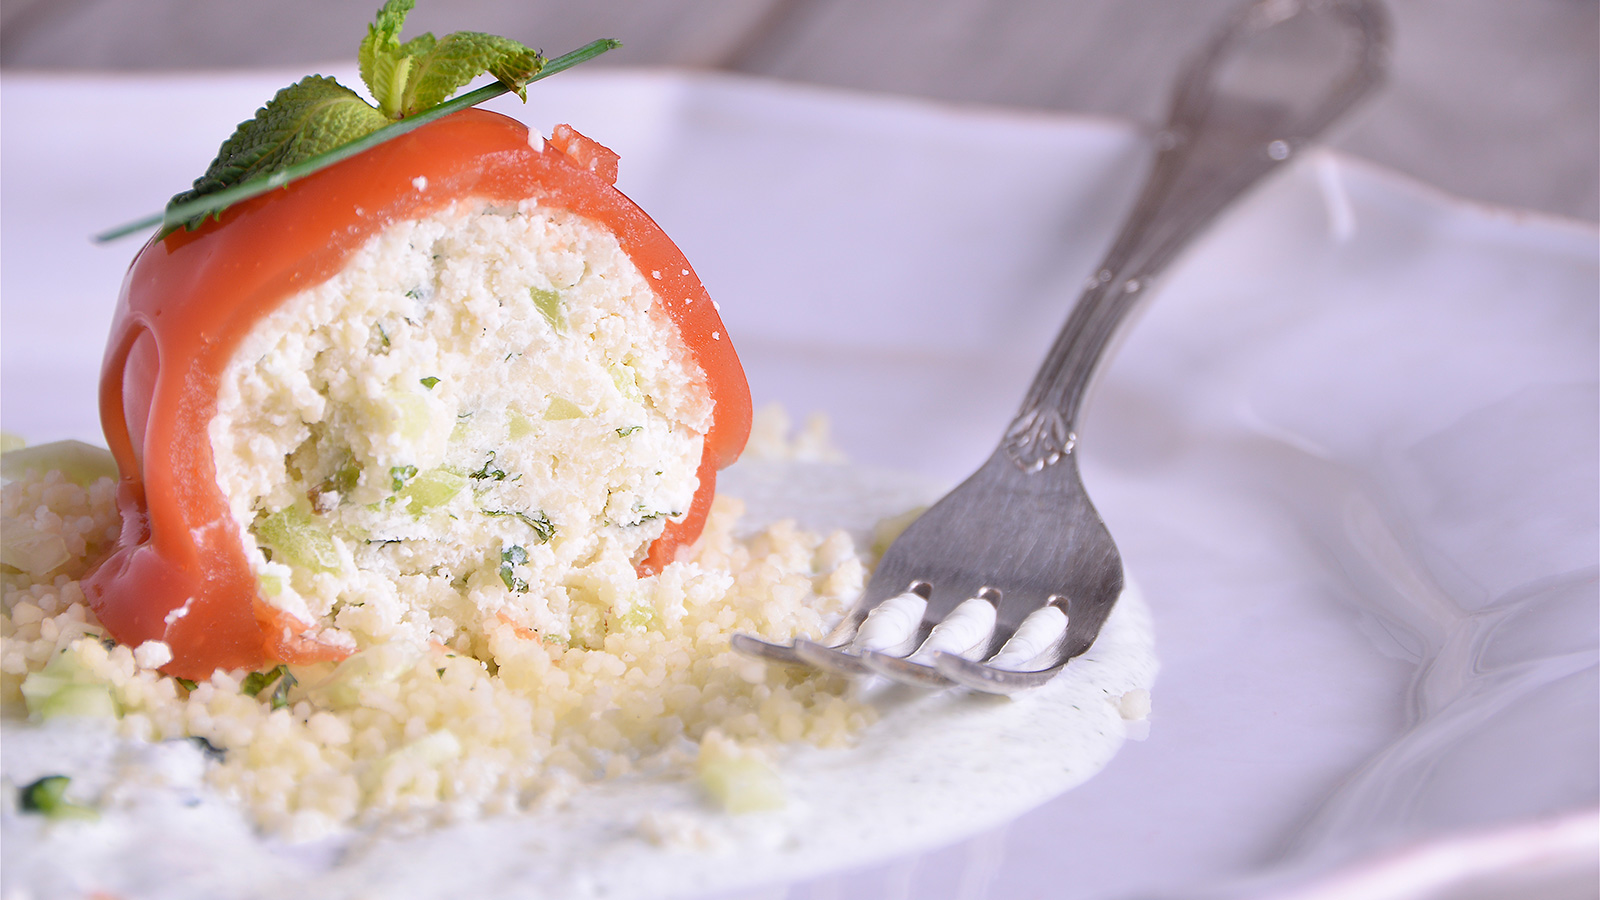 Tomate de tabul con salsa refrescante diana cabrera for Diana cabrera canal cocina